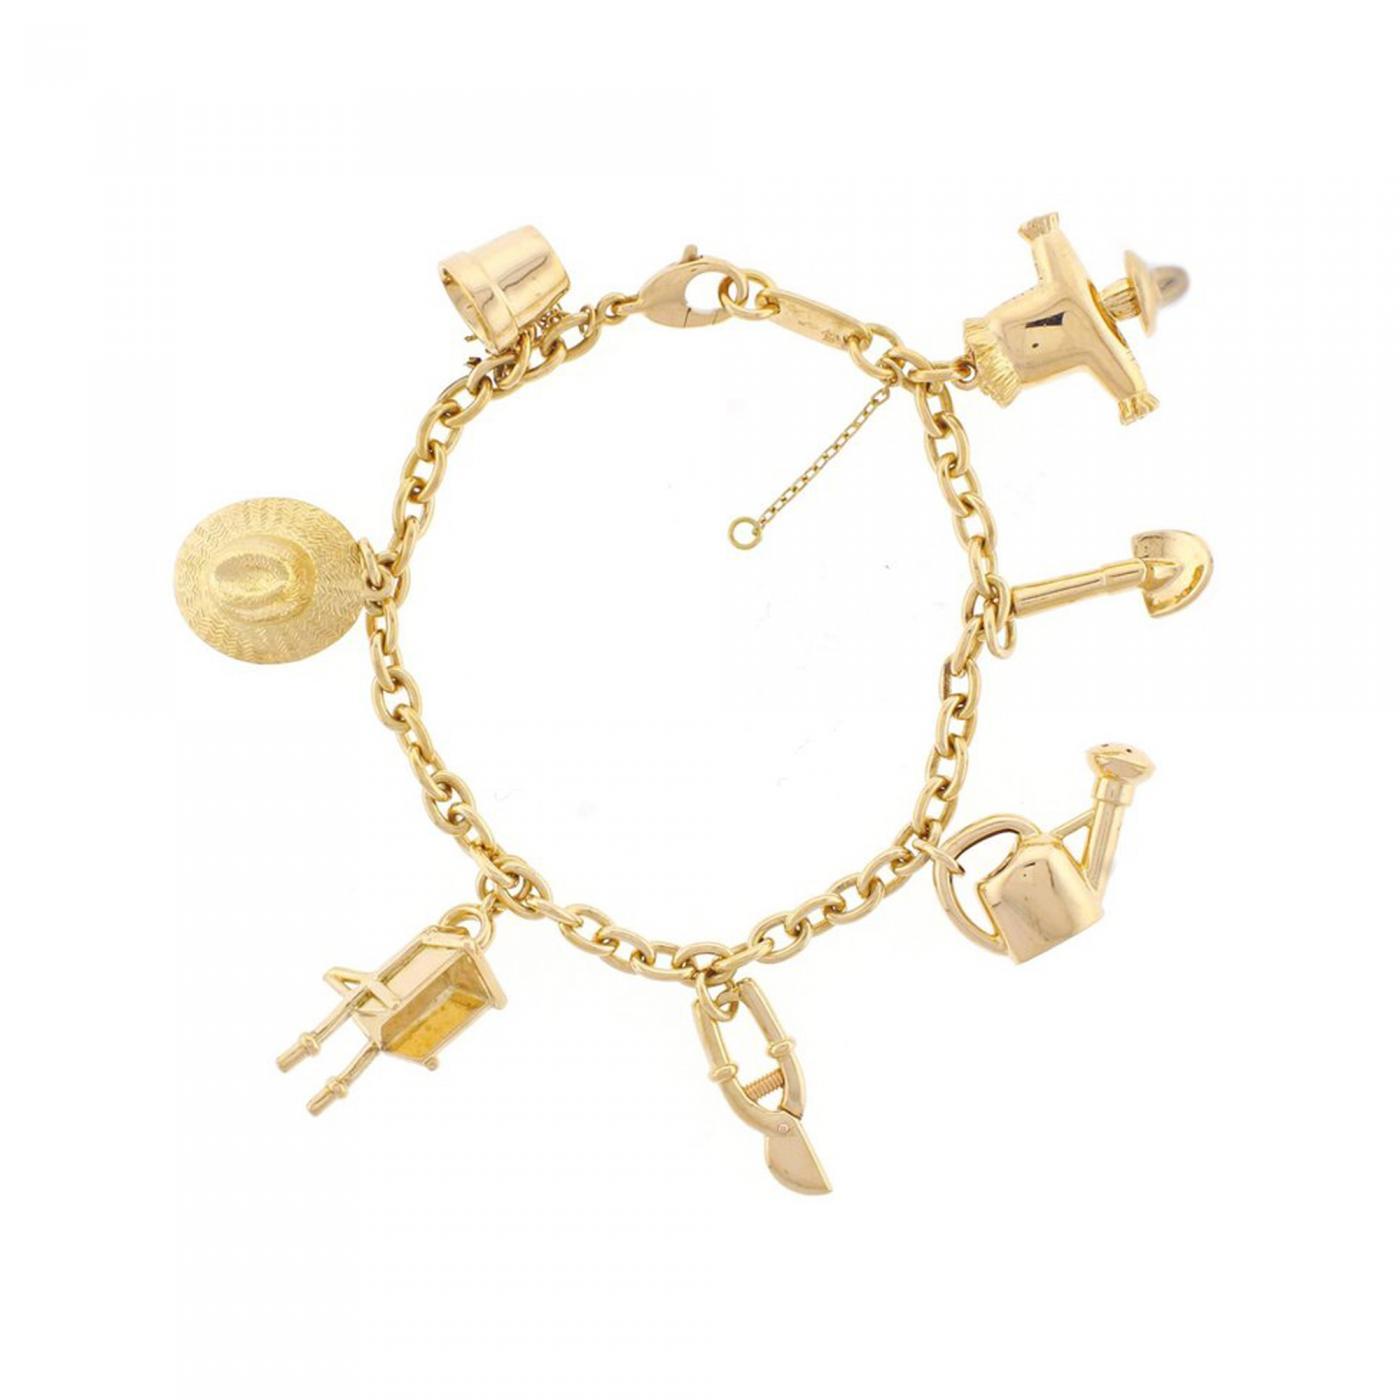 622a9c39fc4c8 Cartier - Cartier Garden Charm Bracelet